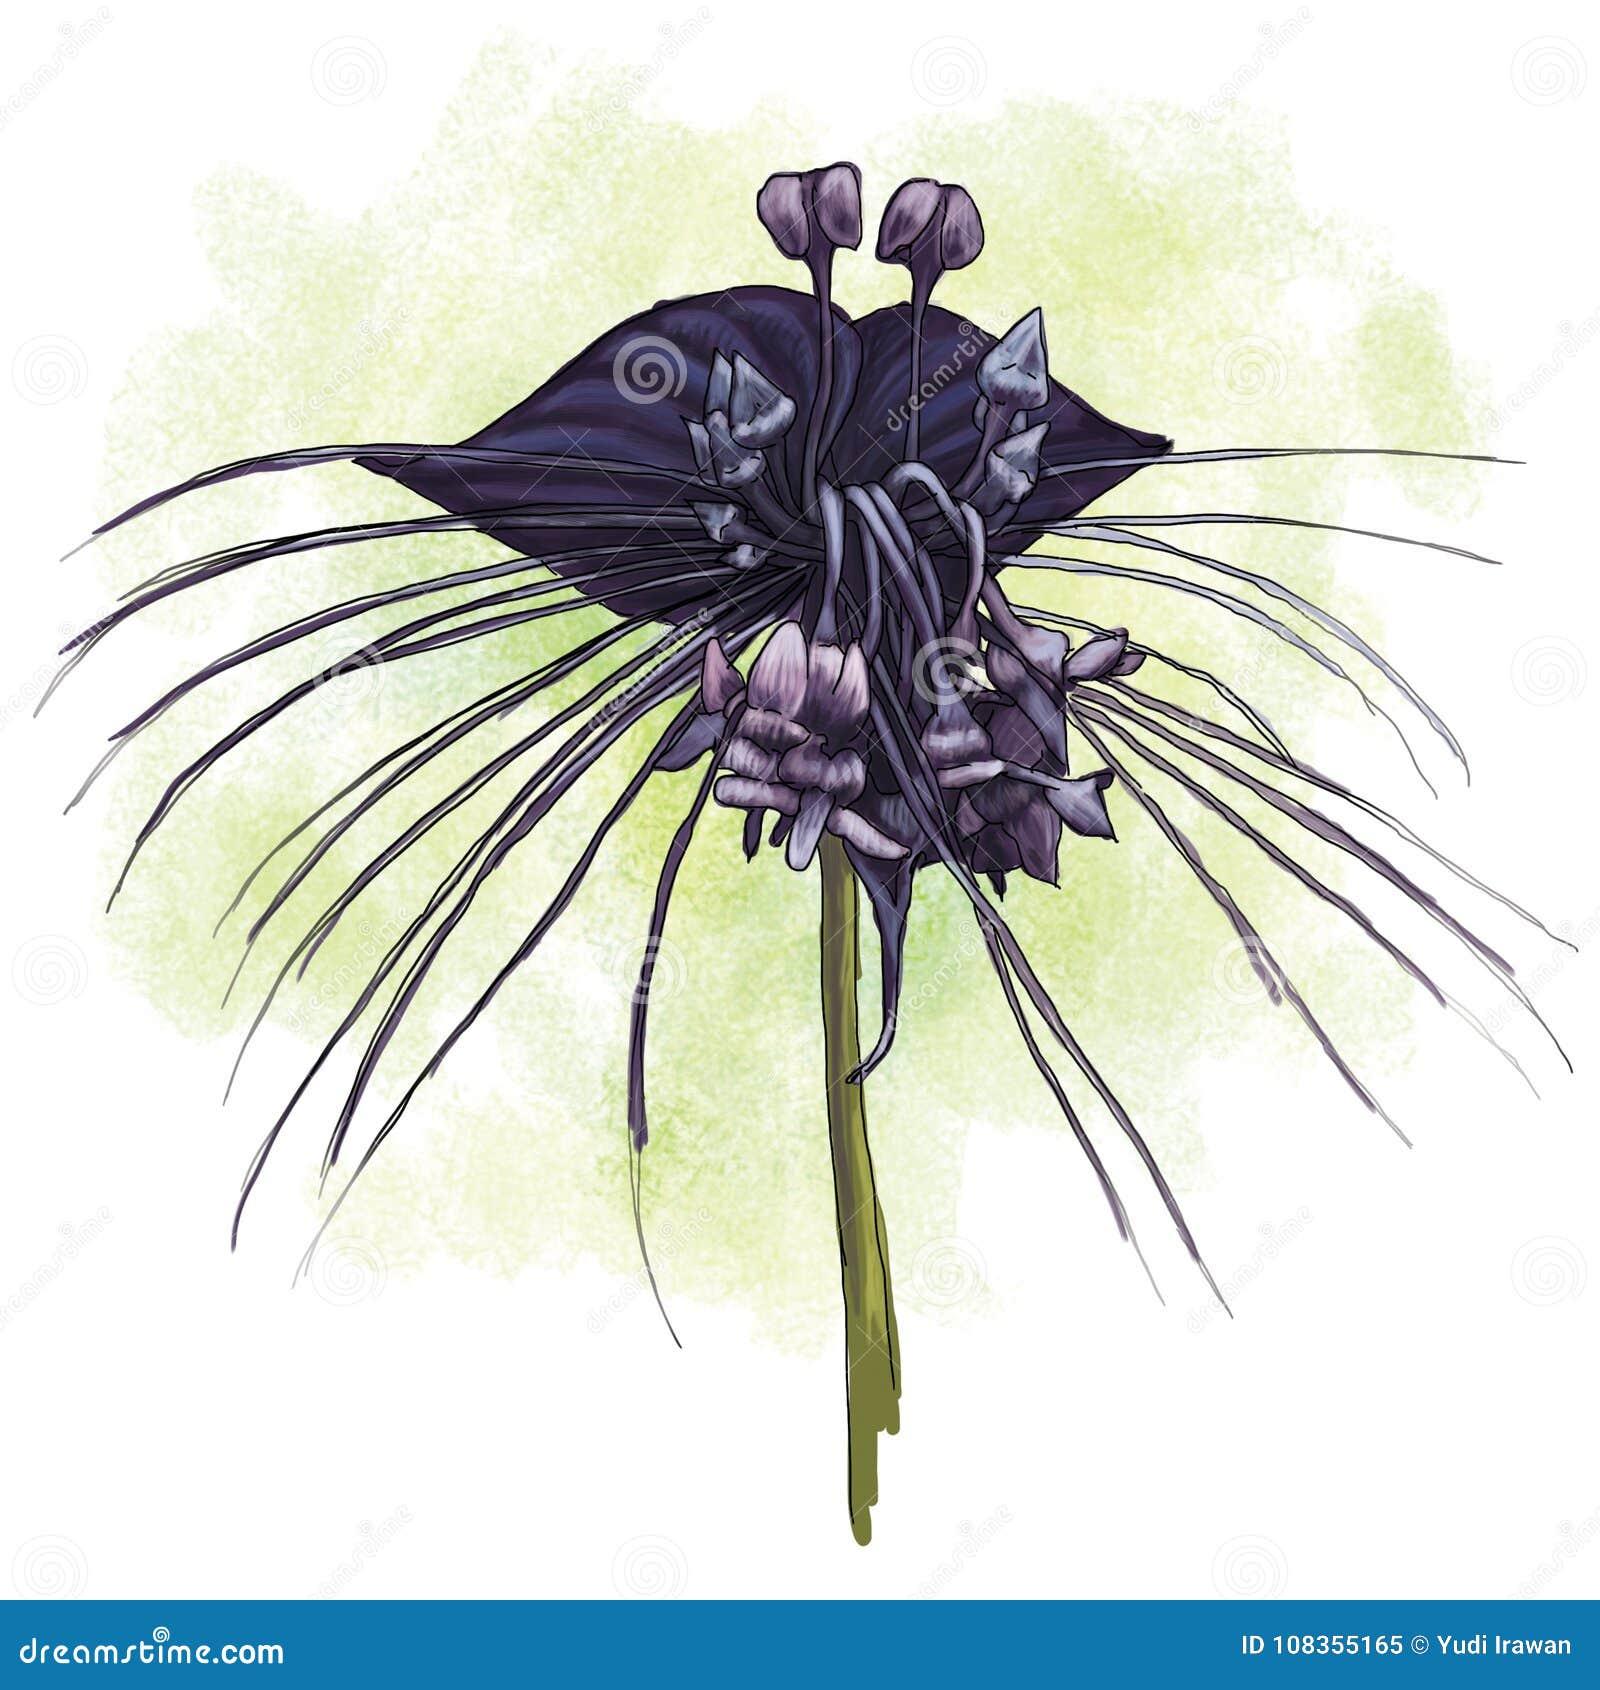 Unduh 470 Koleksi Gambar Bunga Gelap Terang Hd Gratid Gambar Bunga